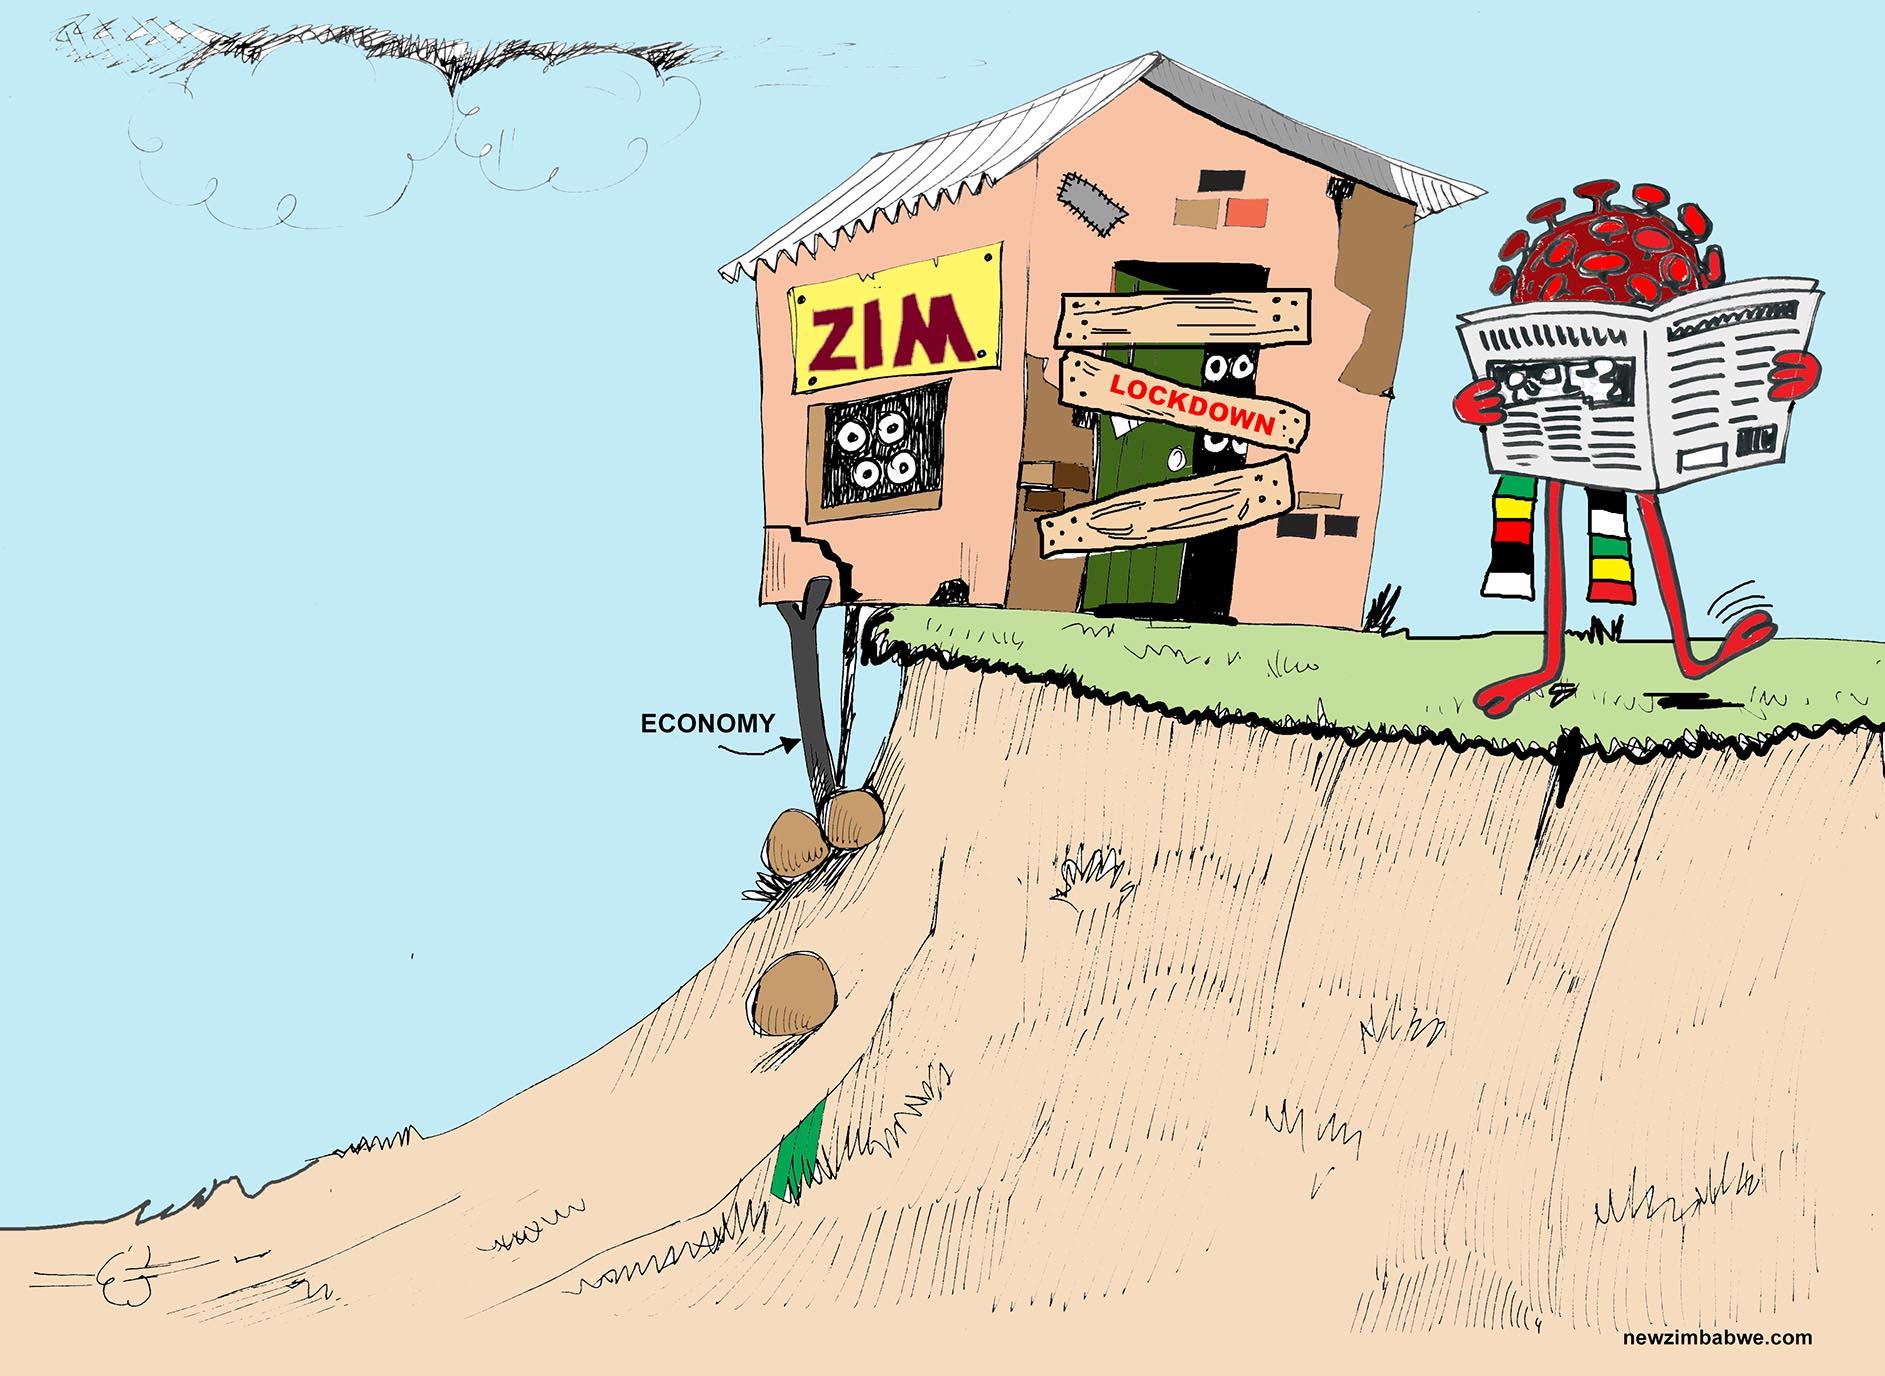 Zim economy, lockdown and covid-19